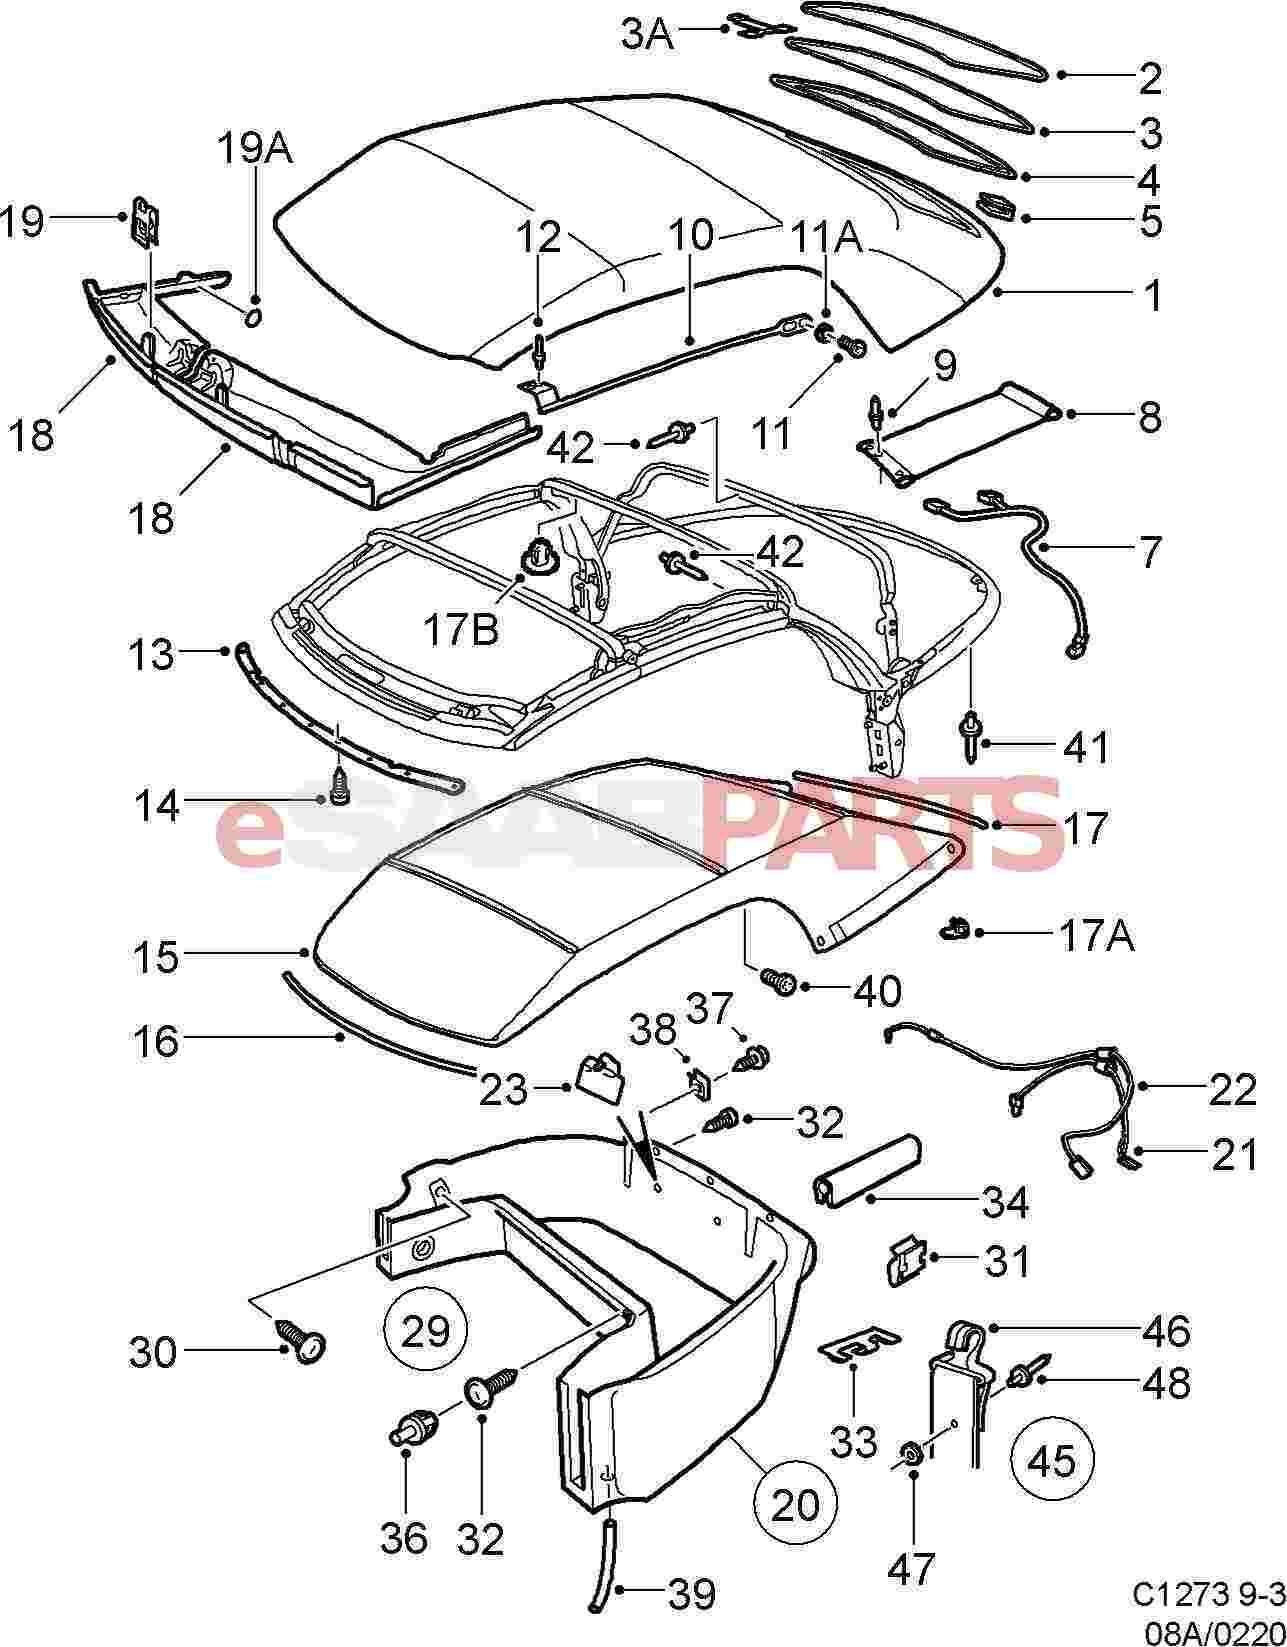 Viewparts 31956 saab 900 wiring diagram at ww1 freeautoresponder co